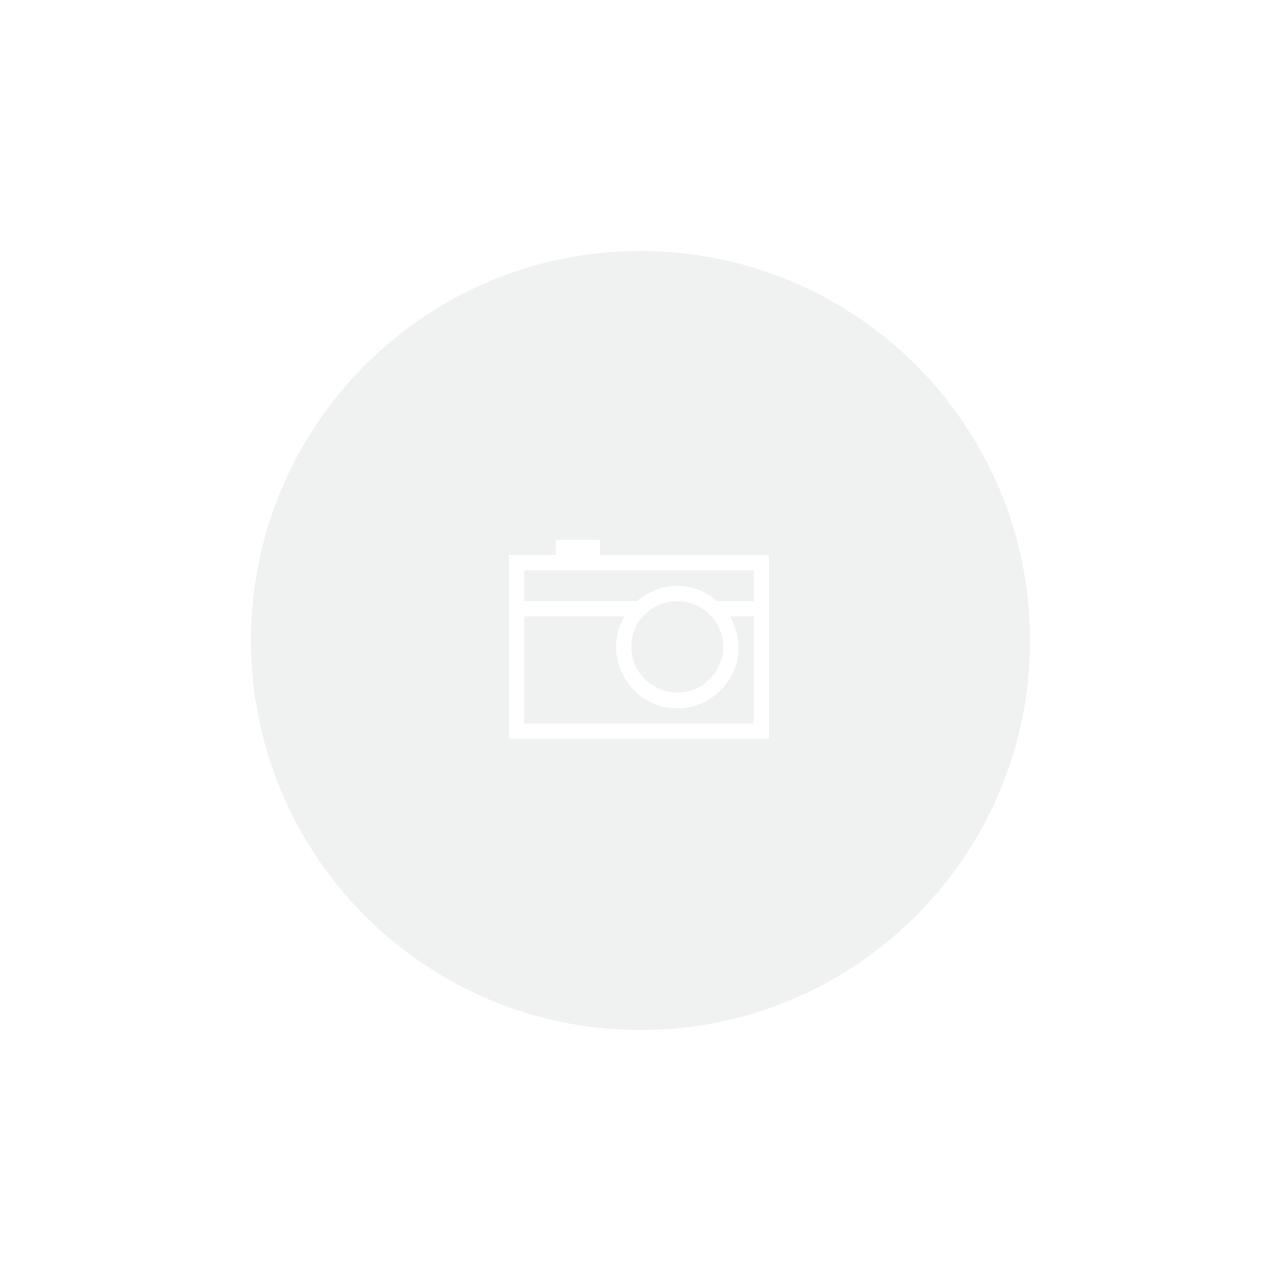 HD Notebook 1TB Seagate Laptop BarraCuda SATA 6.0Gb/s - ST1000LM048